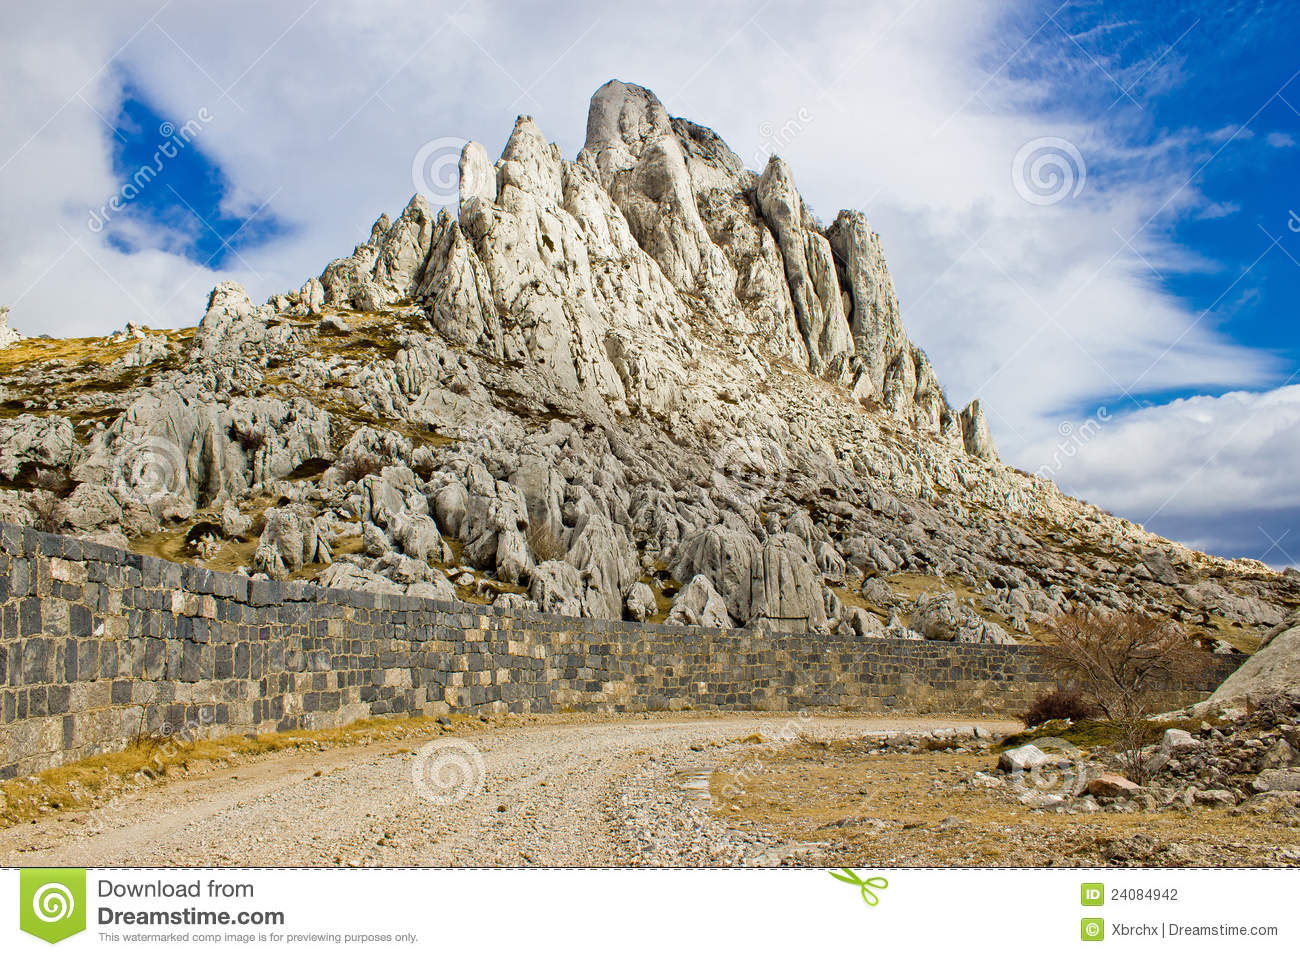 Tulove Grede Rocks On Velebit Mountain Stock Photography.